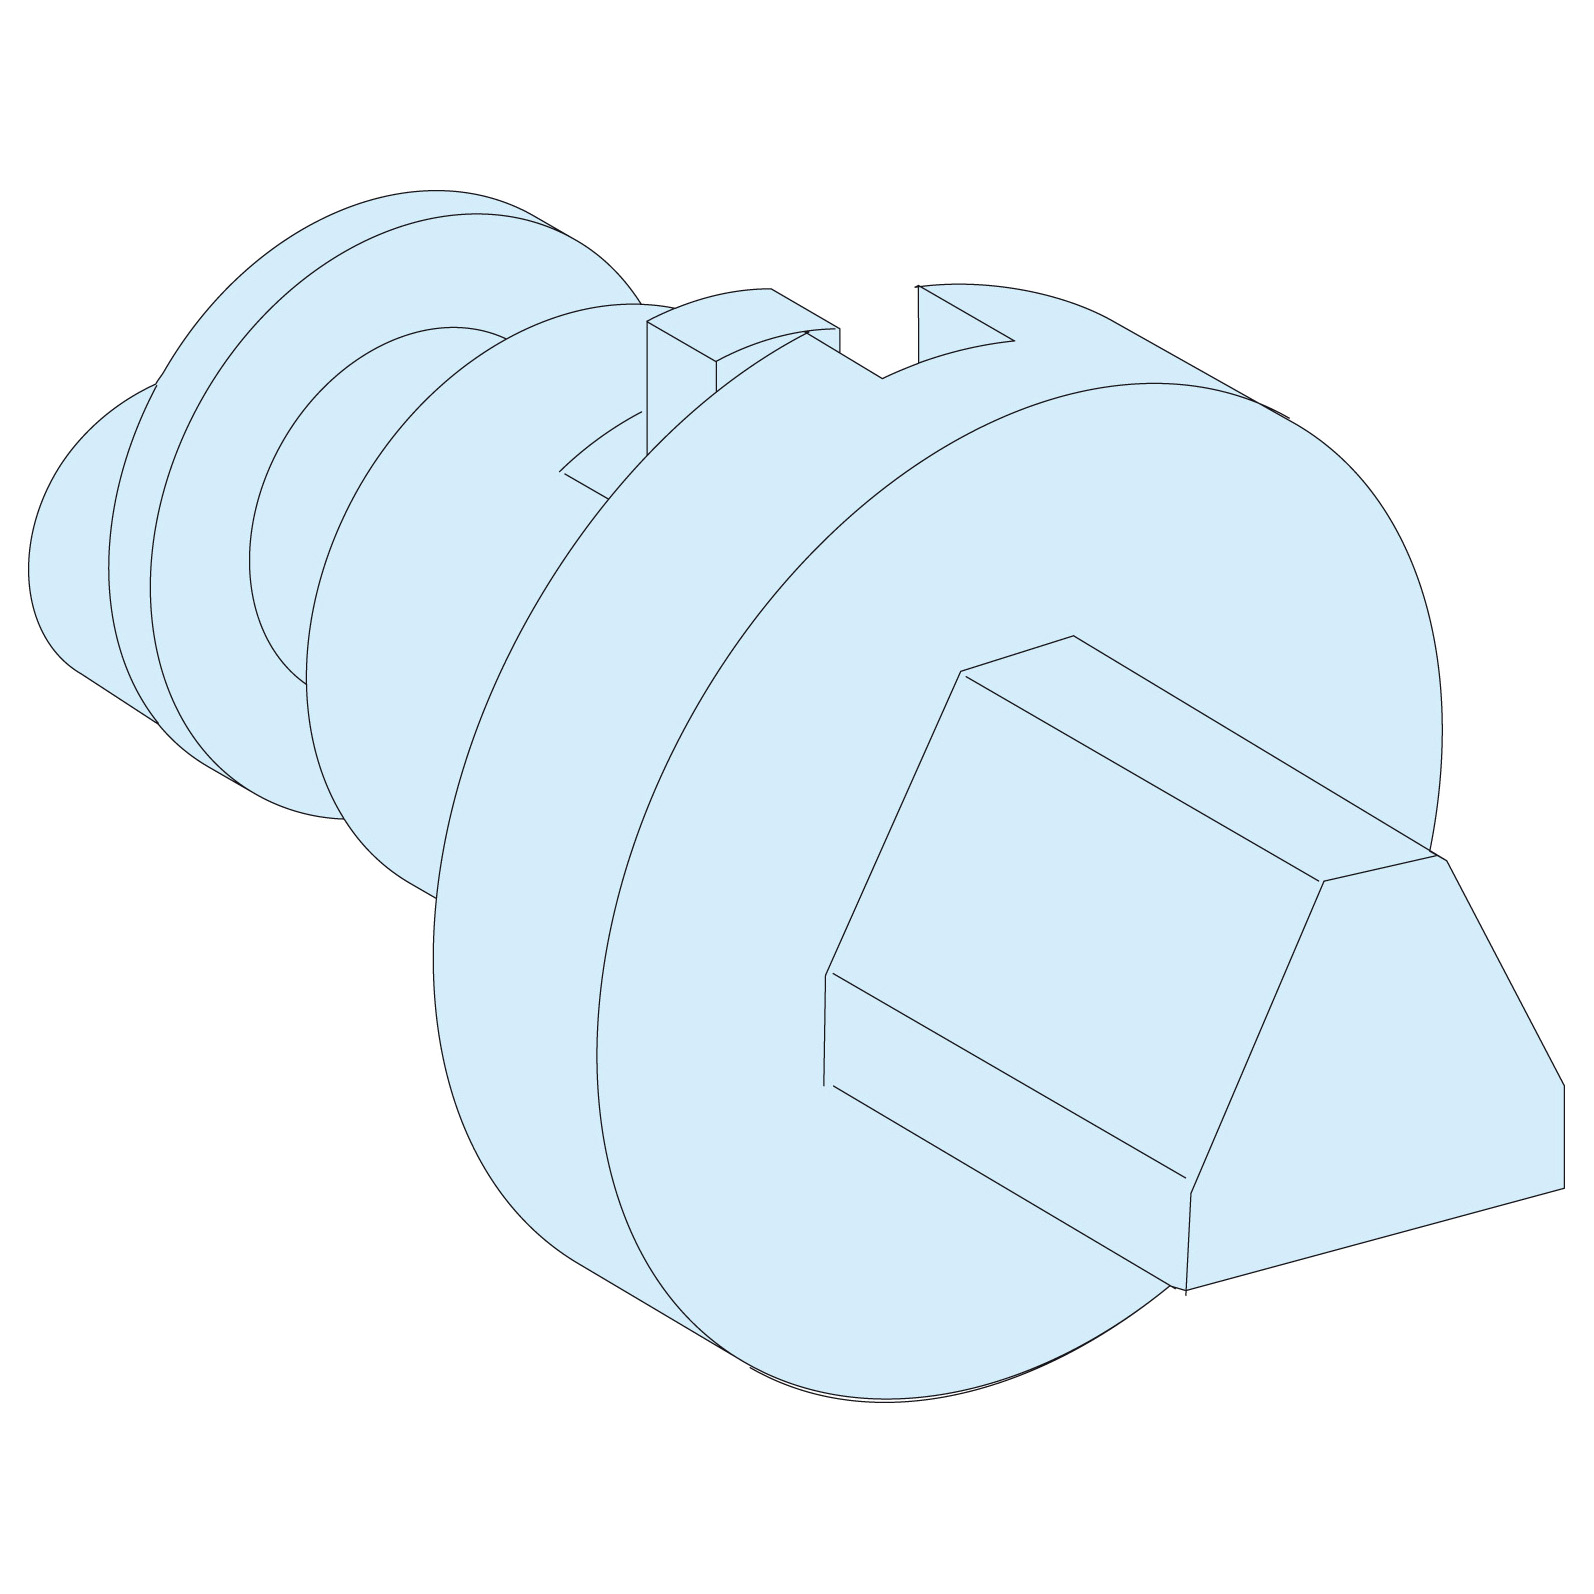 Image Description for https://tedi.itc-electronics.com/itcmedia/images/20190426/09937_SCHNEIDERELECTRIC_1.jpeg